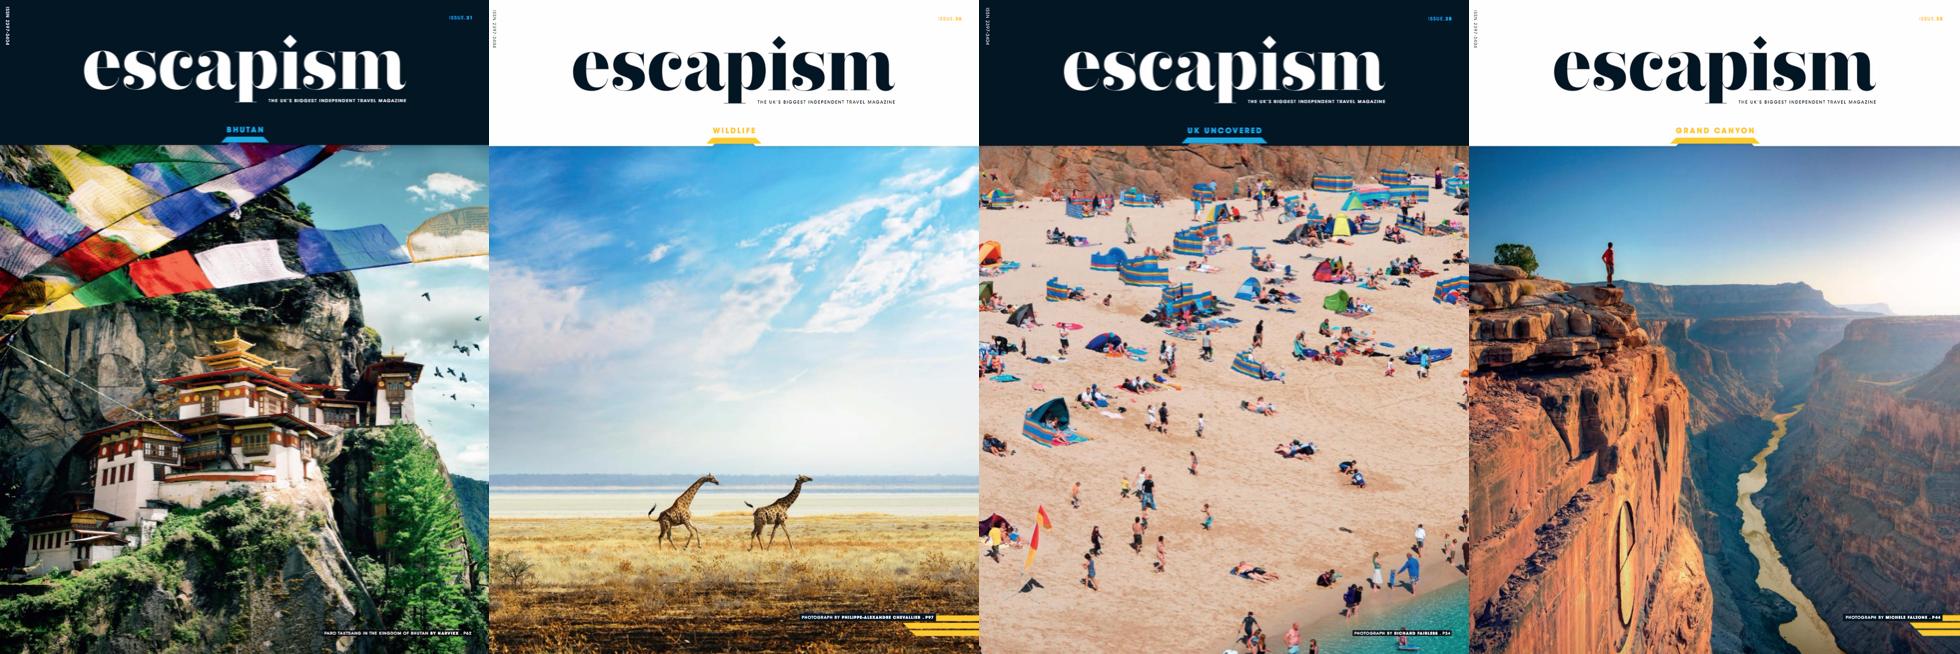 escapism_magazine_joost_bastmeijer.png